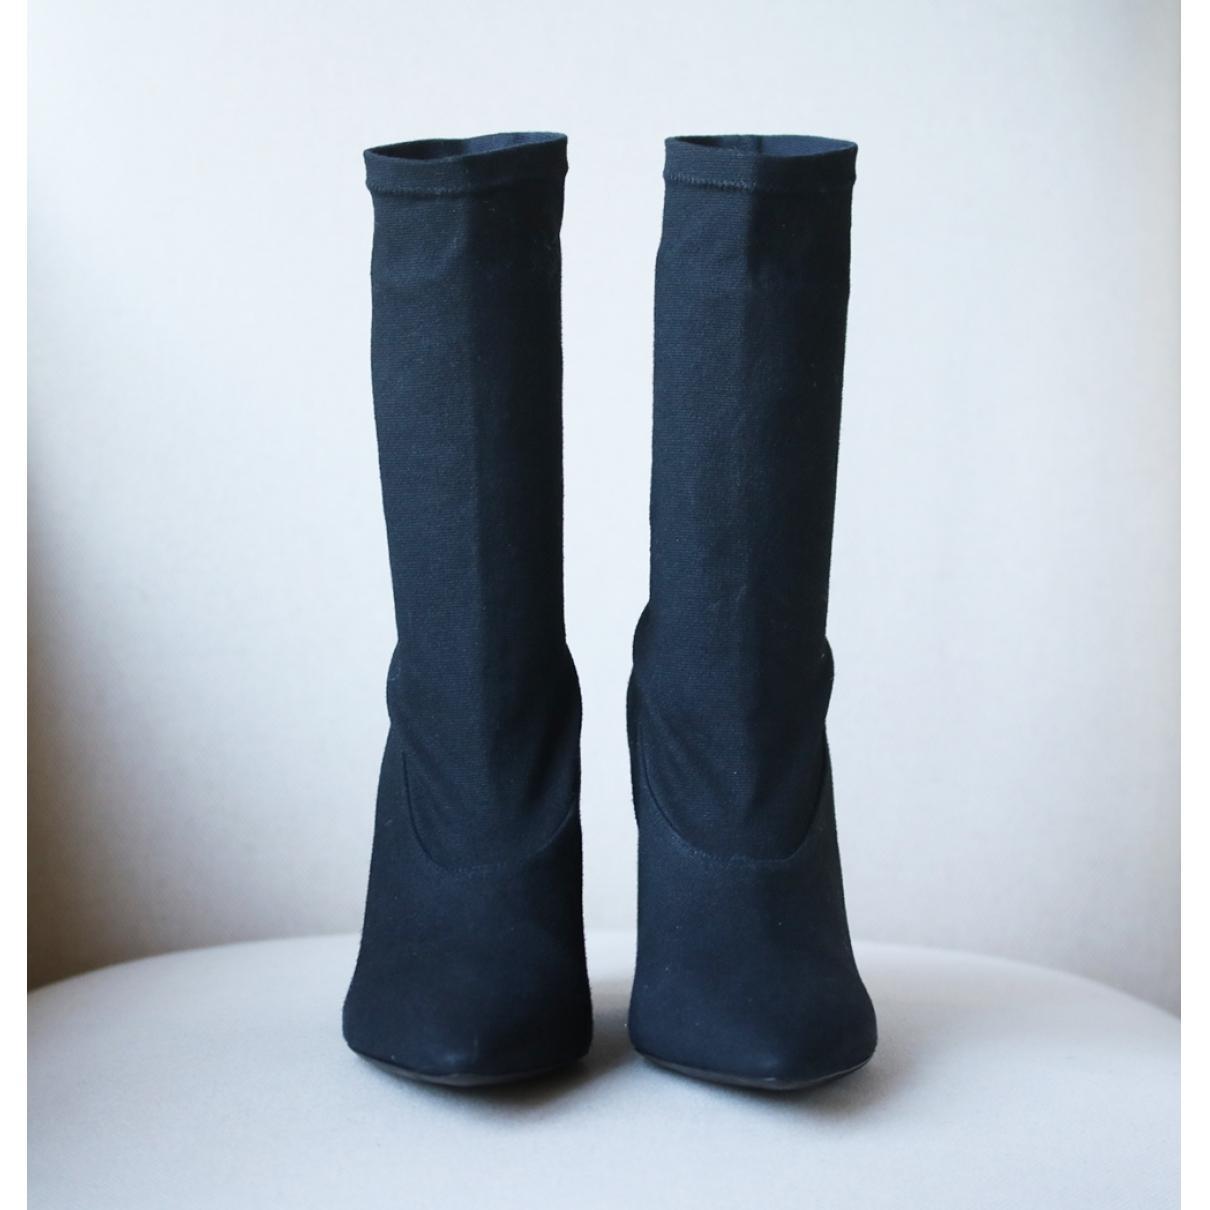 Botines de Lona Yeezy de color Azul